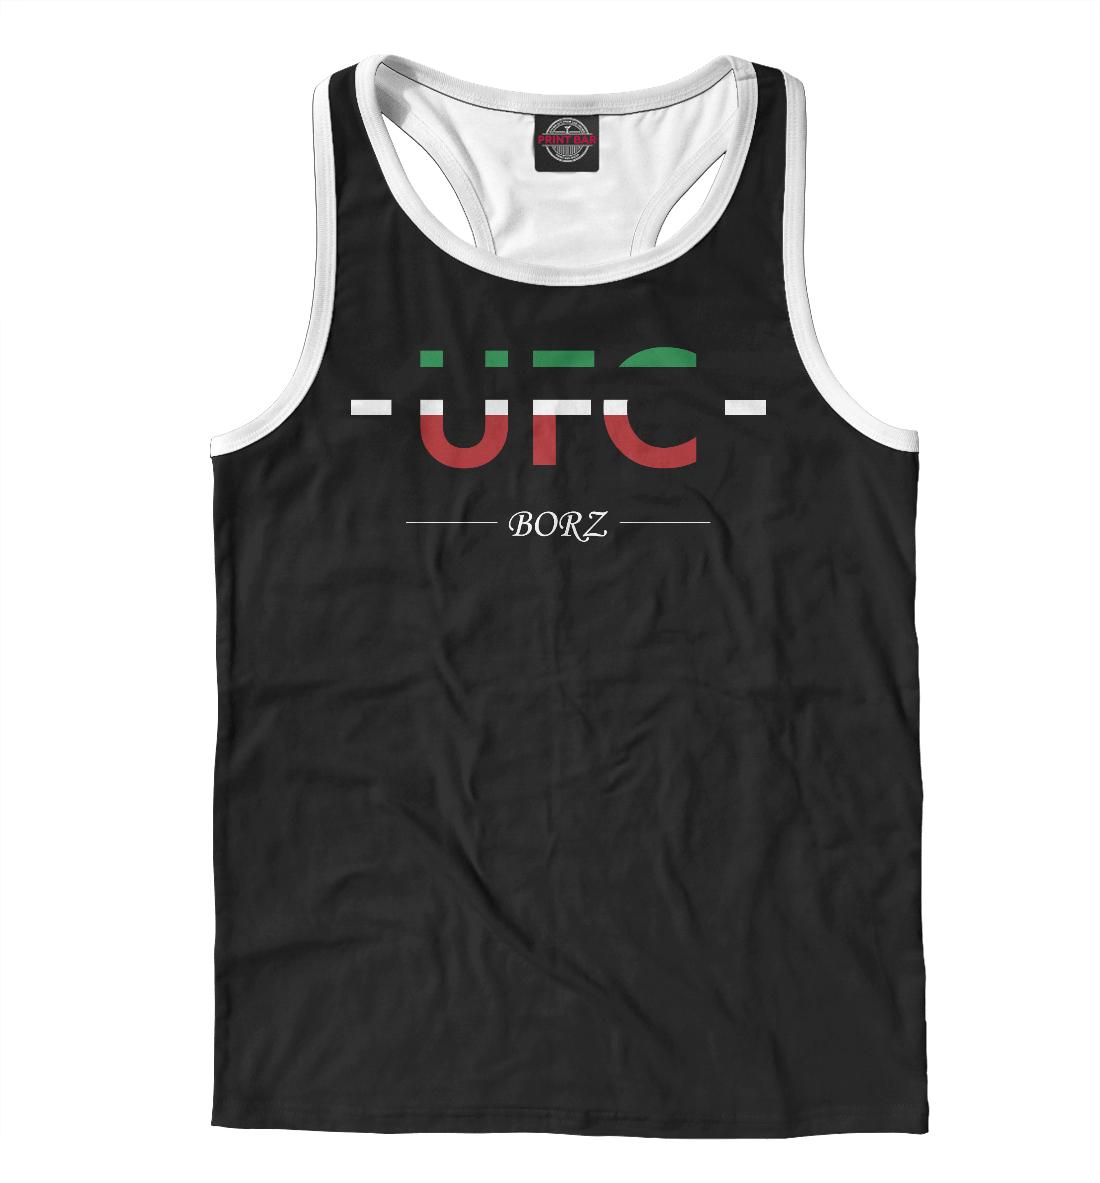 Купить UFC Borz, Printbar, Майки борцовки, MNU-162394-mayb-2